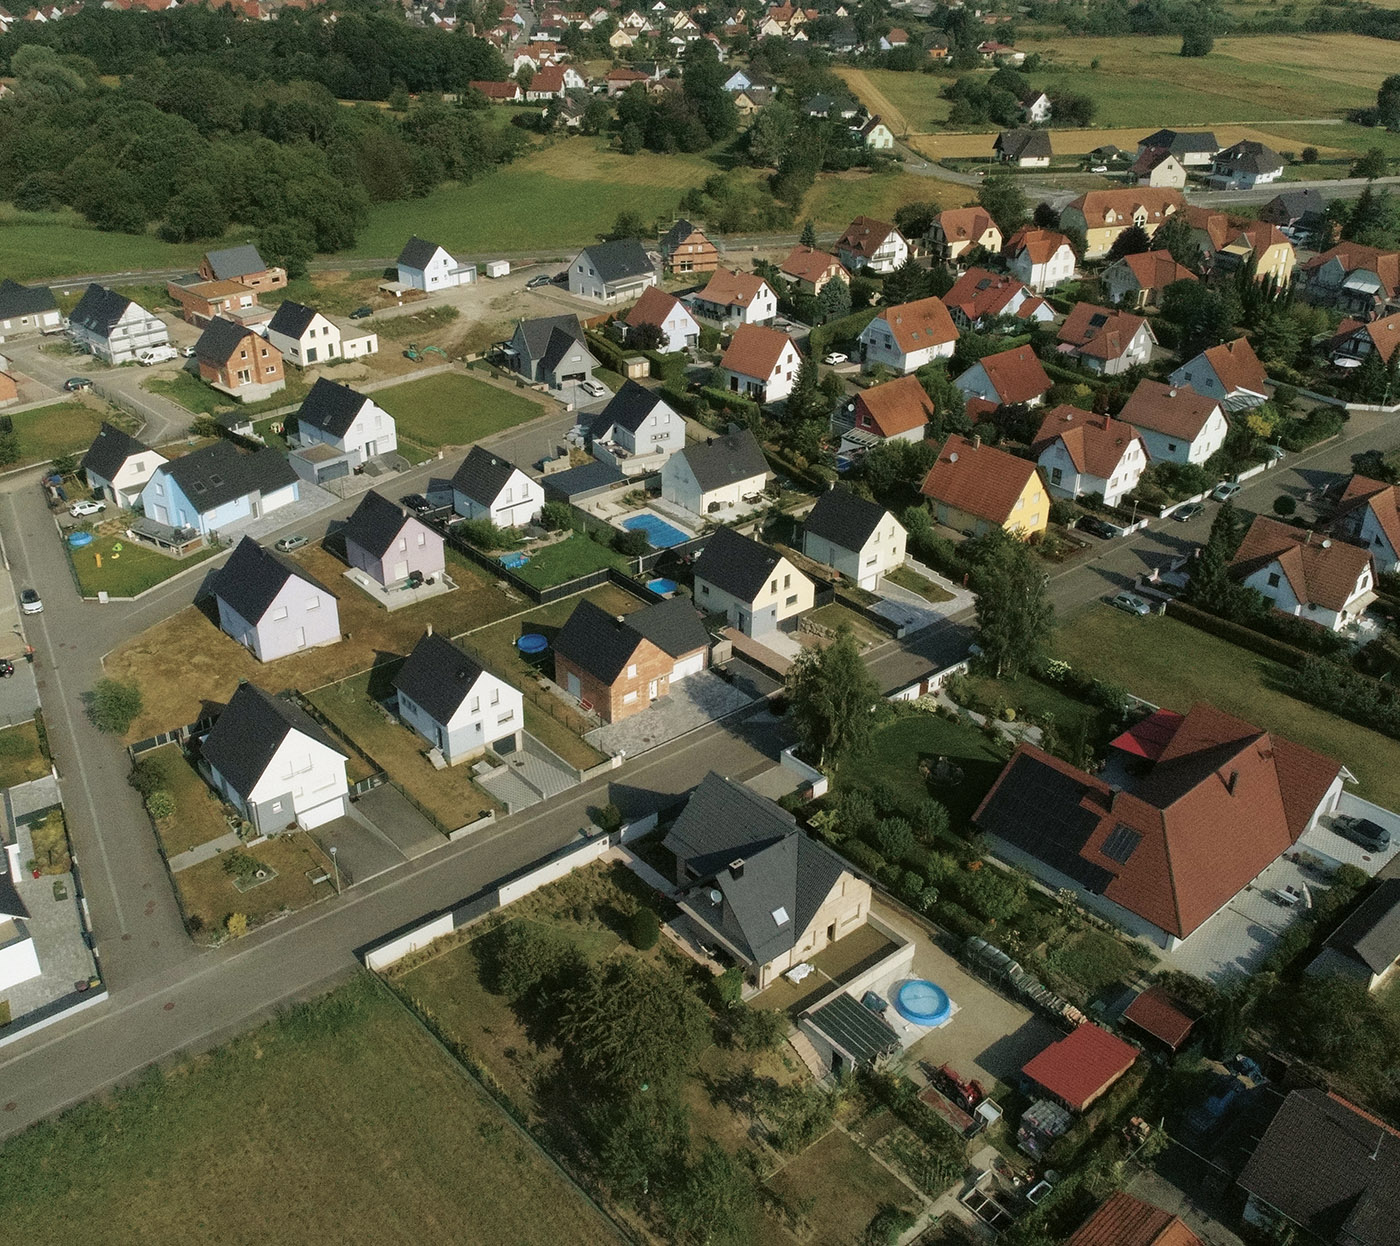 Vente de terrains à Sessenheim